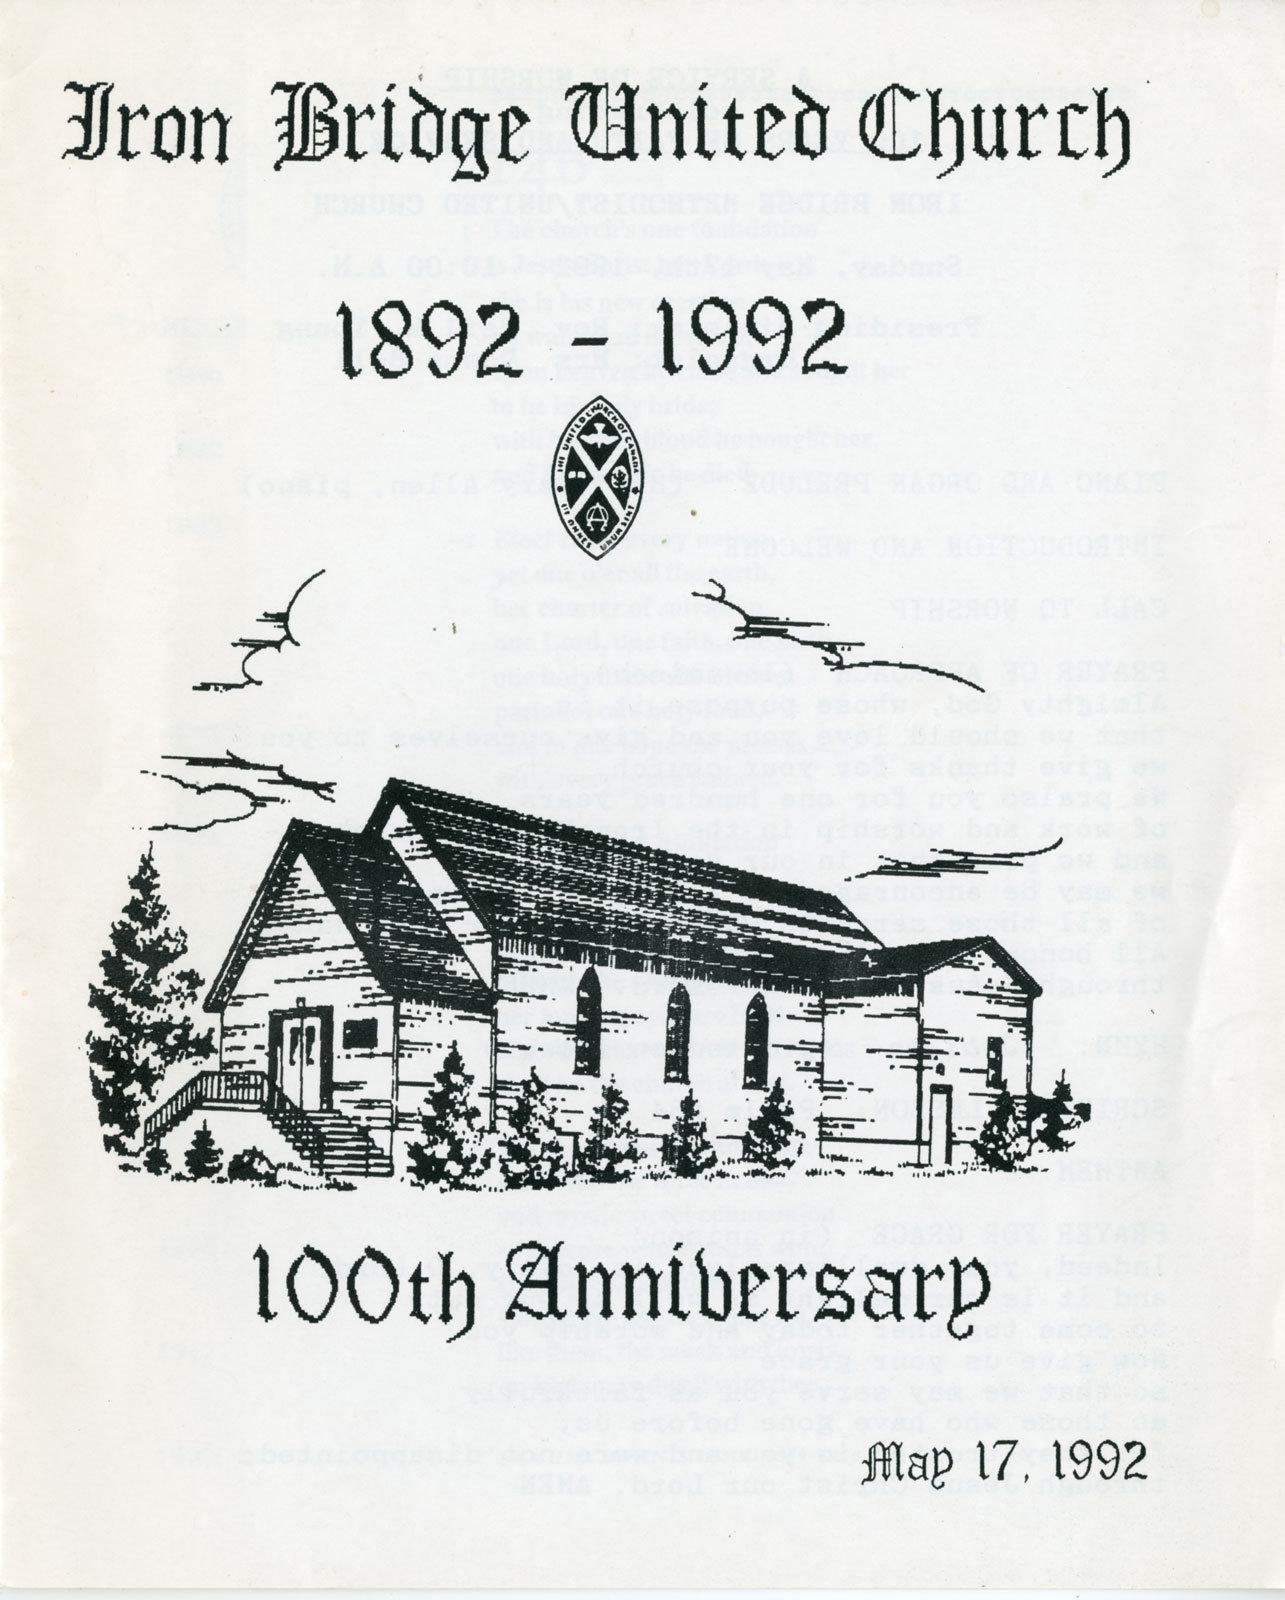 Iron Bridge United Church 100th Anniversary Church Service Program, 1992